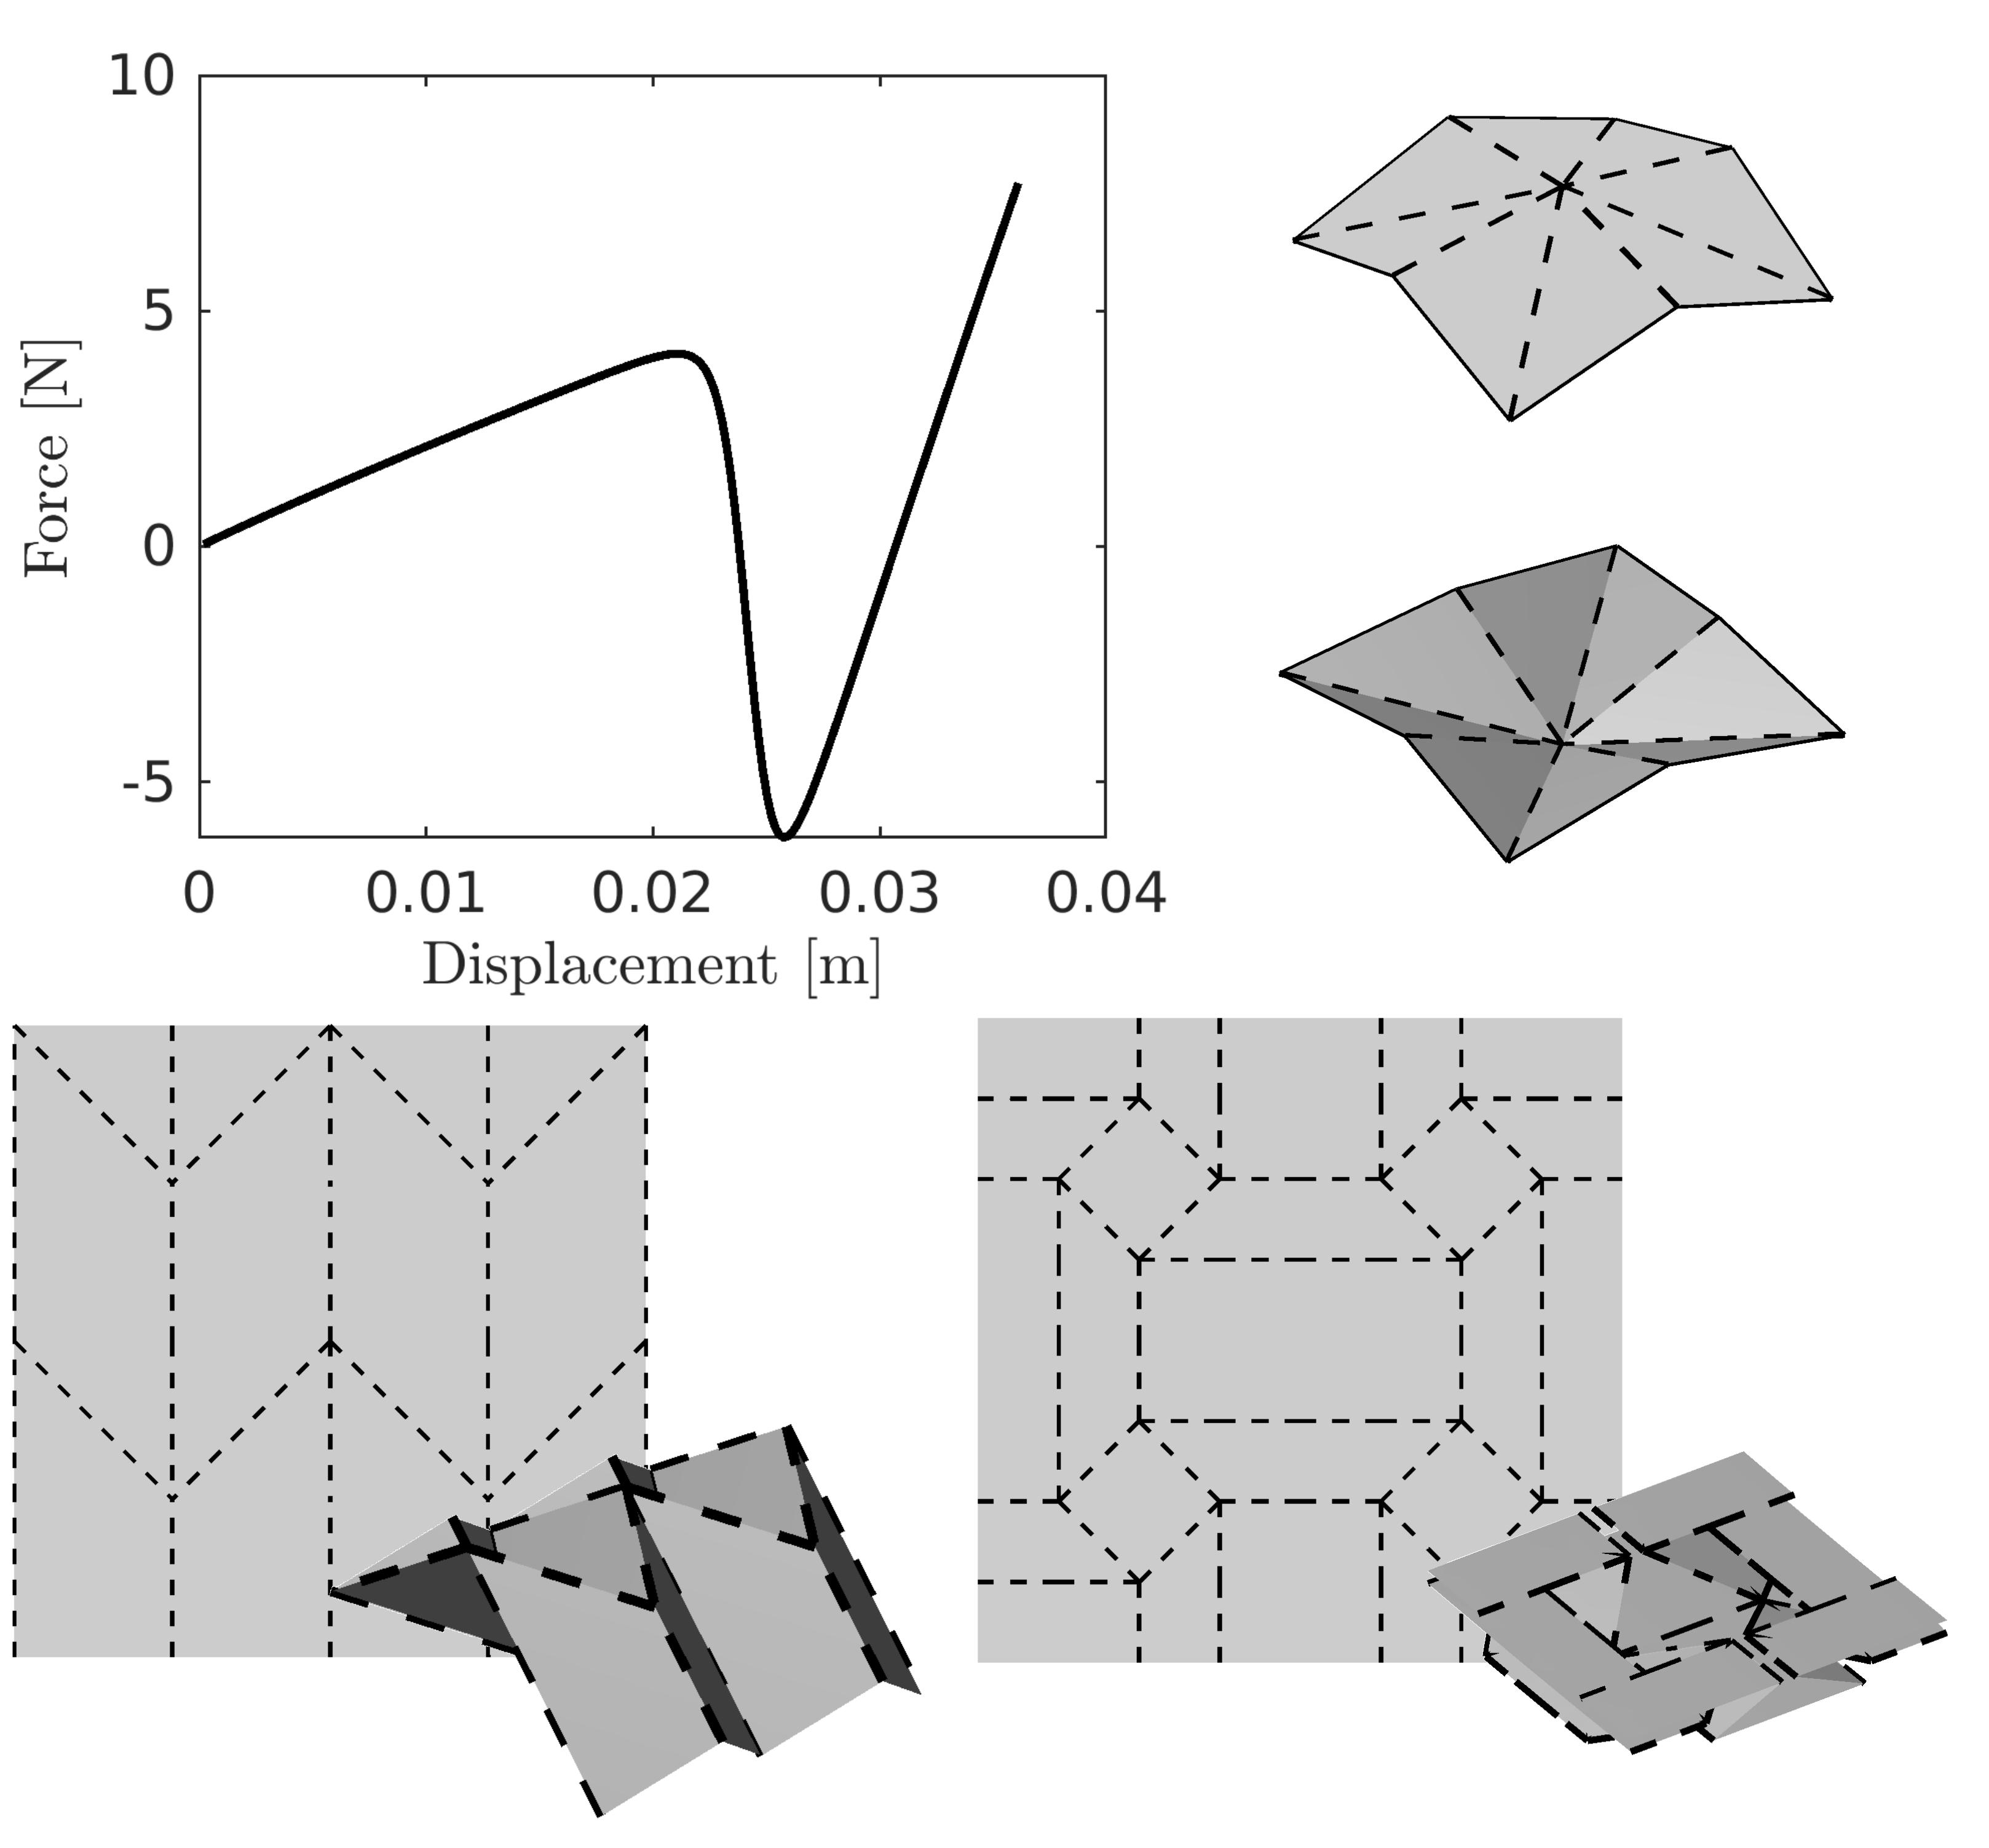 Origami Topology Optimization w/ Nonlinear Truss Model